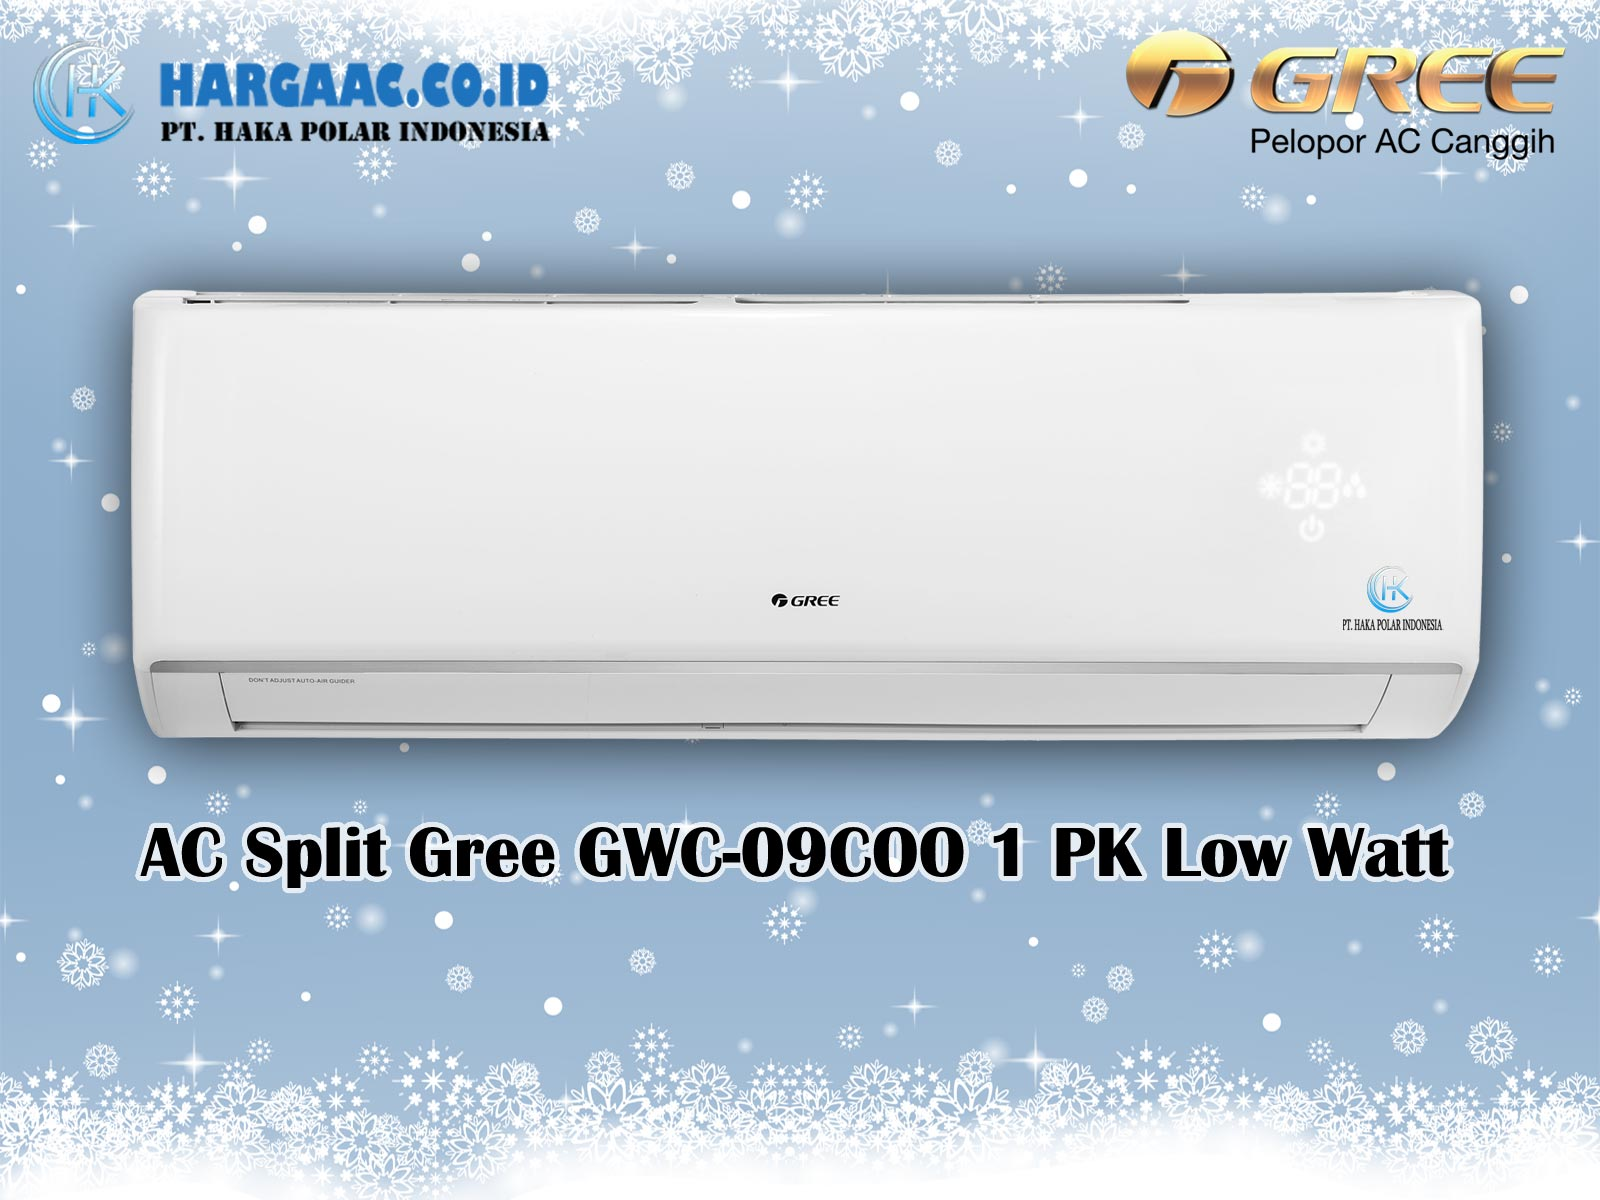 Harga Jual AC Split Gree GWC-09COO 1 PK Low Watt